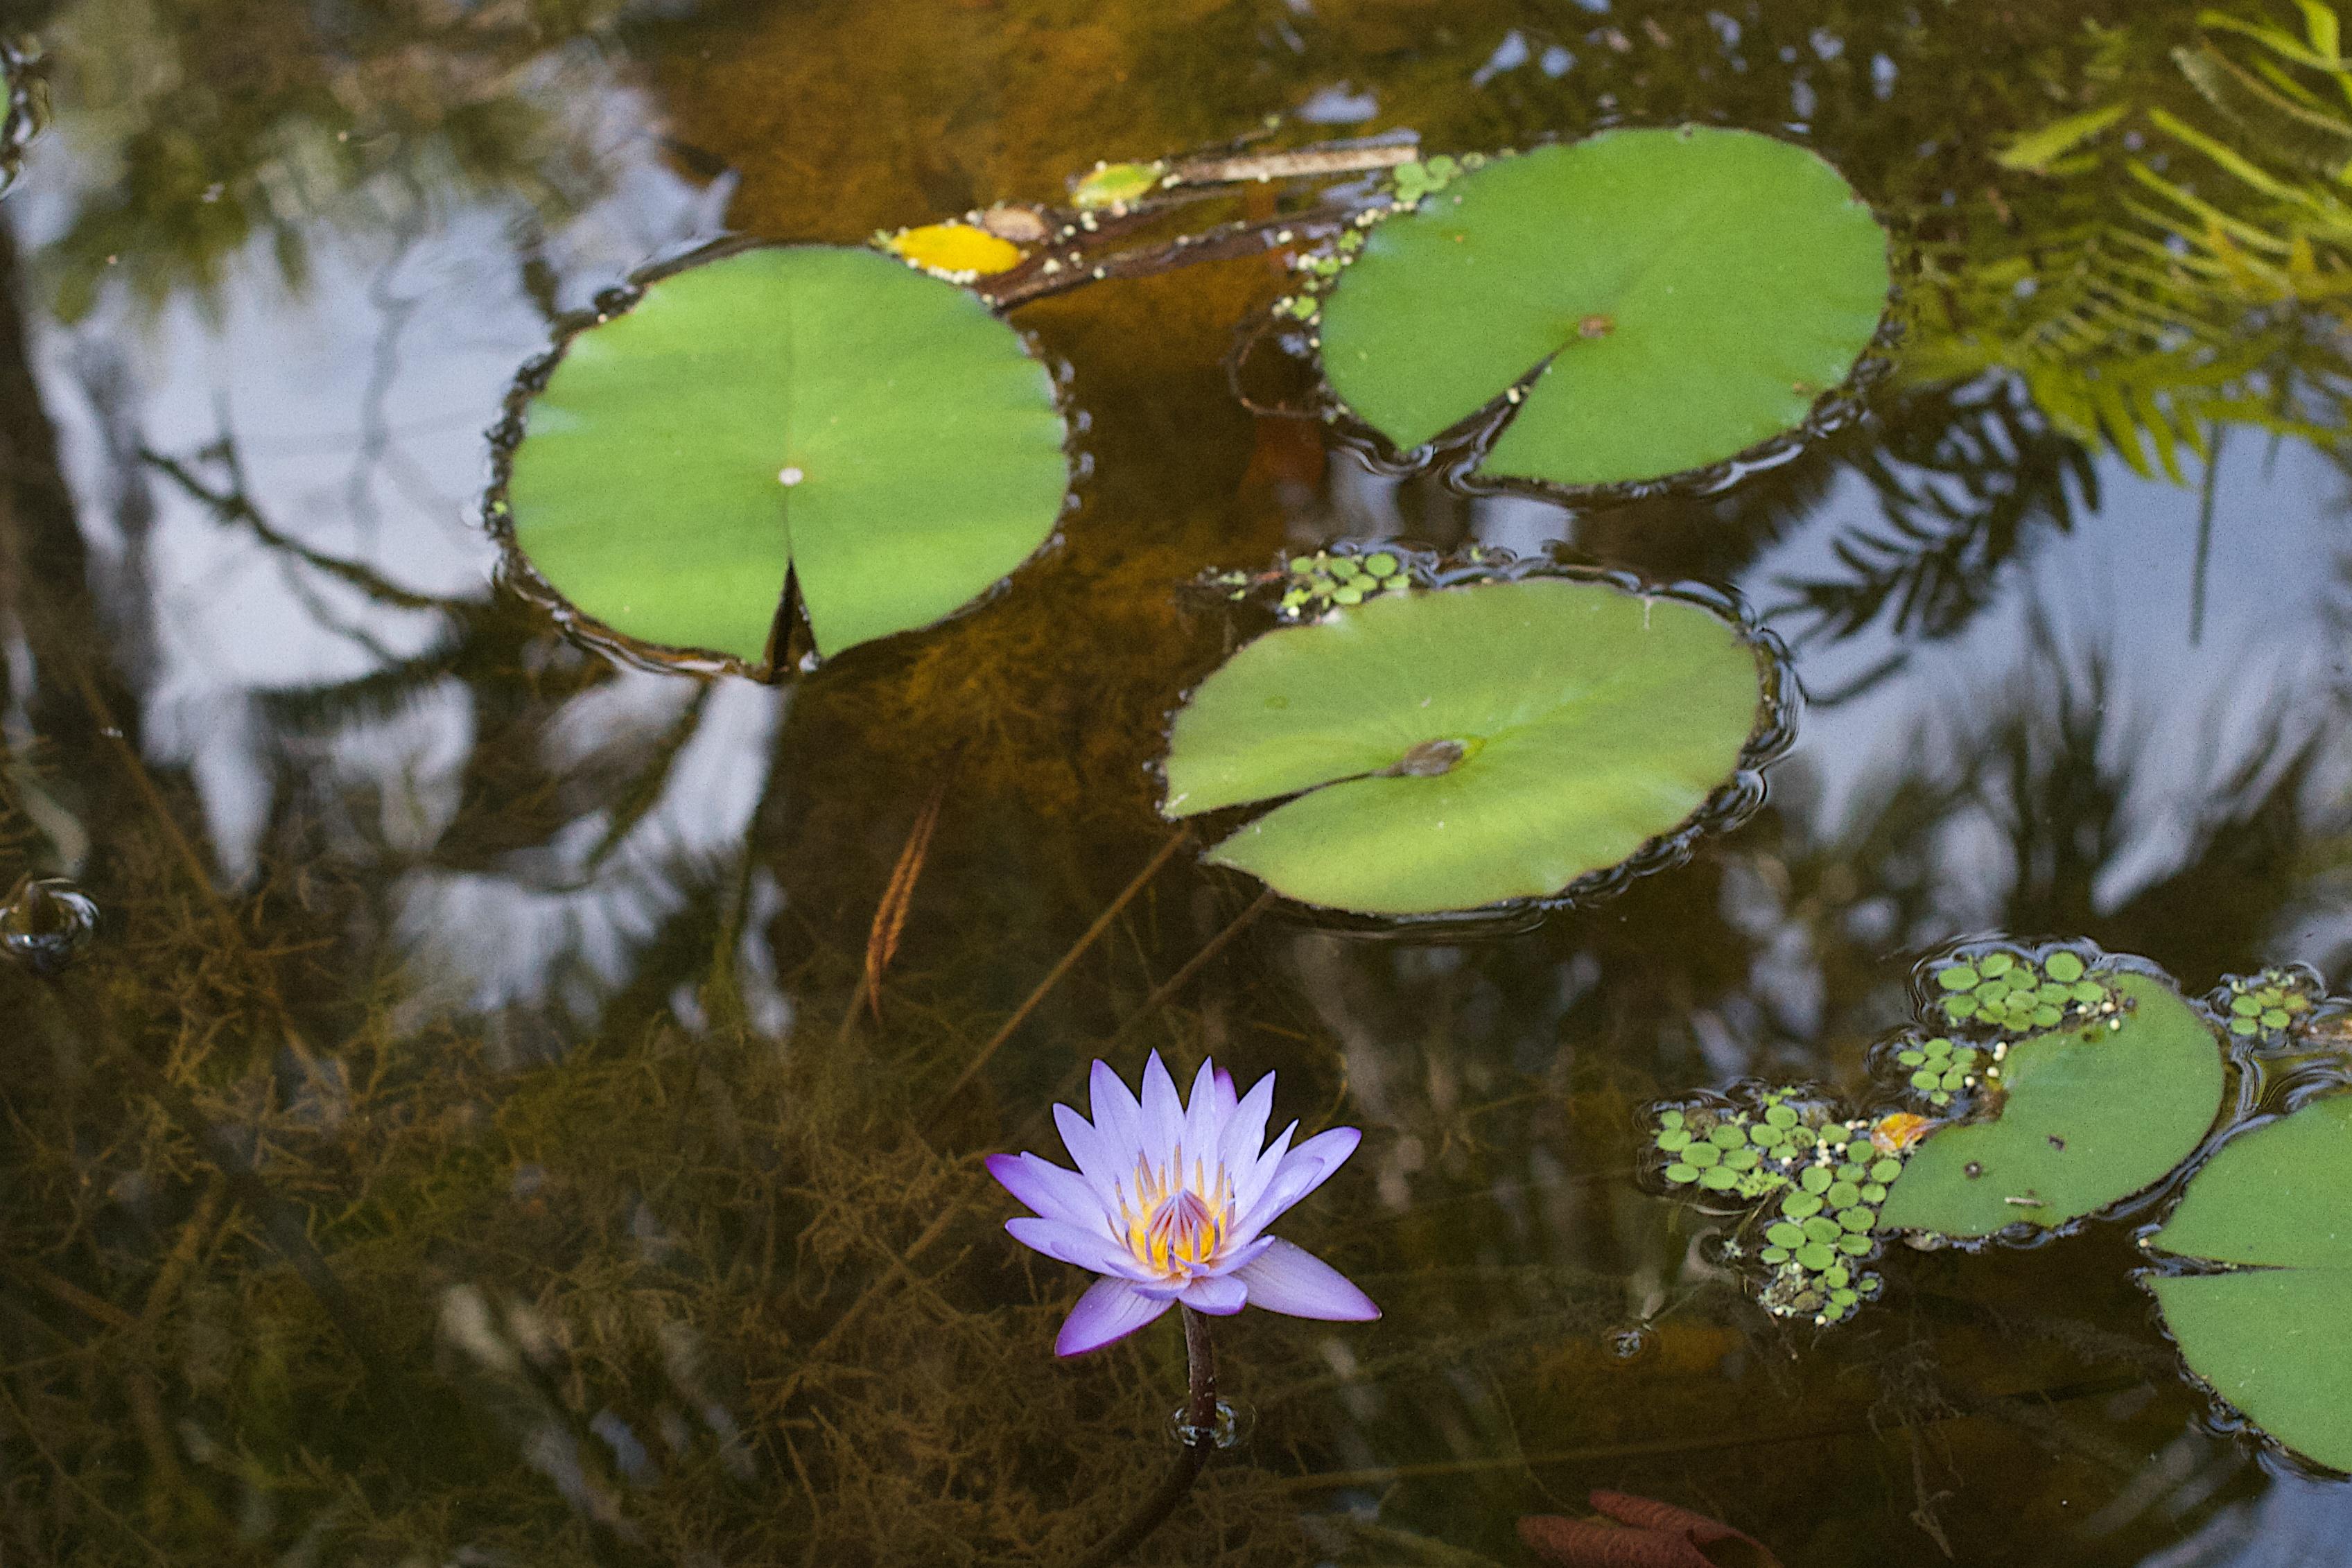 free images tree nature sunlight leaf flower pond green